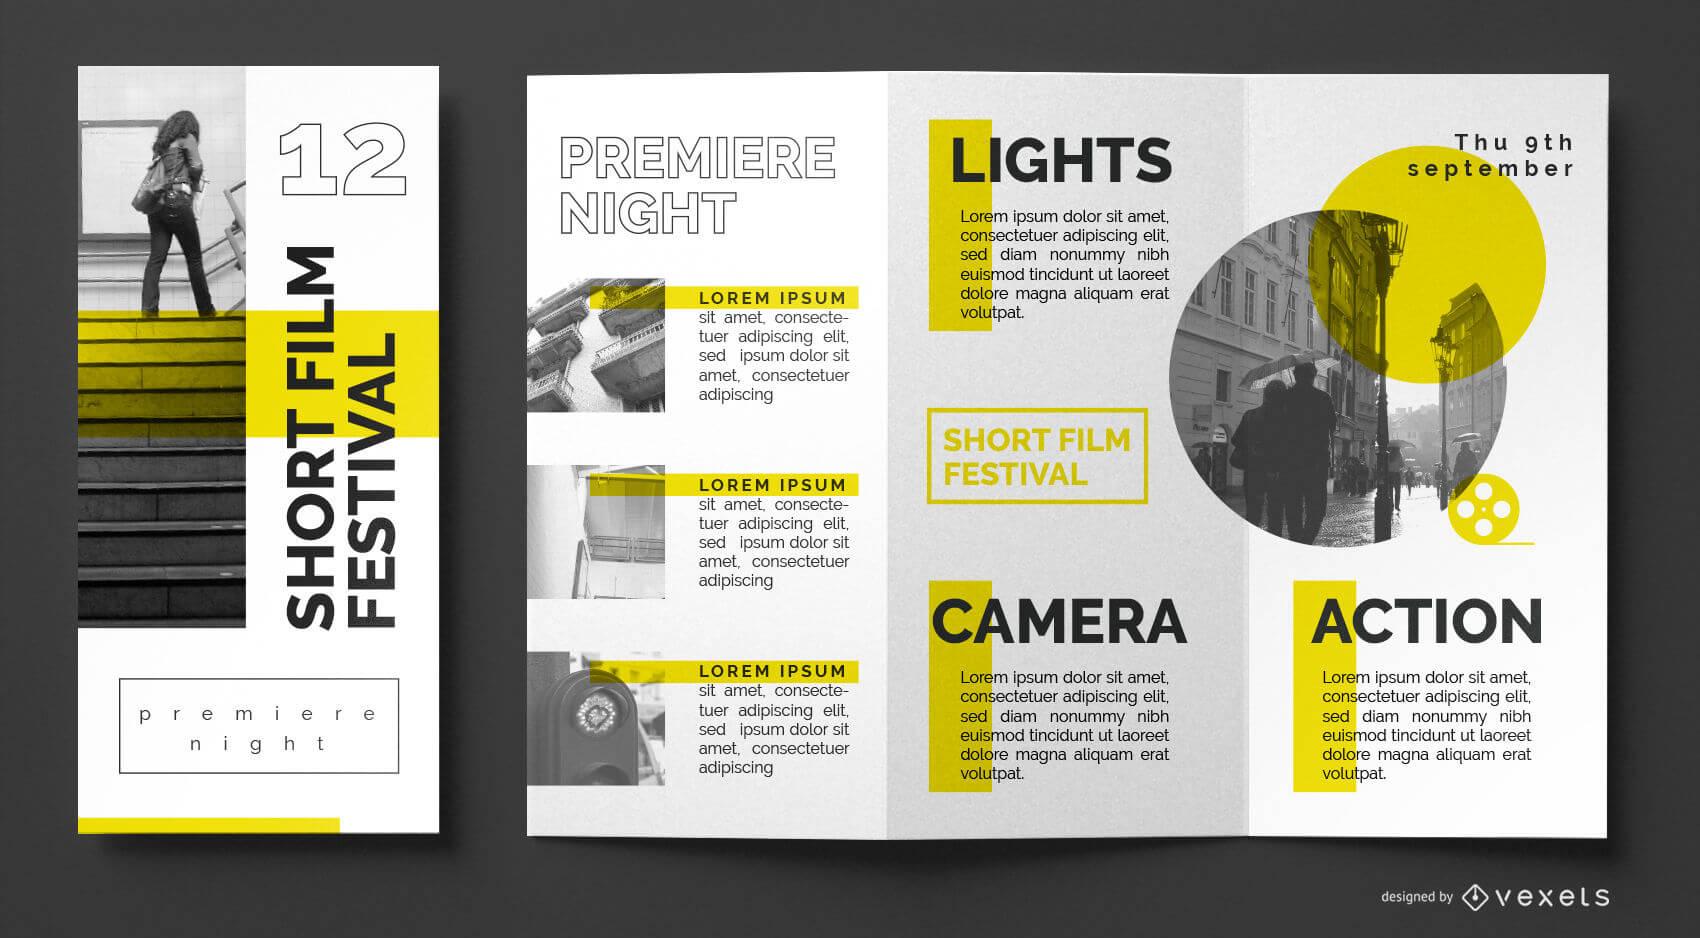 Film Festival Brochure Template - Vector Download Regarding Film Festival Brochure Template